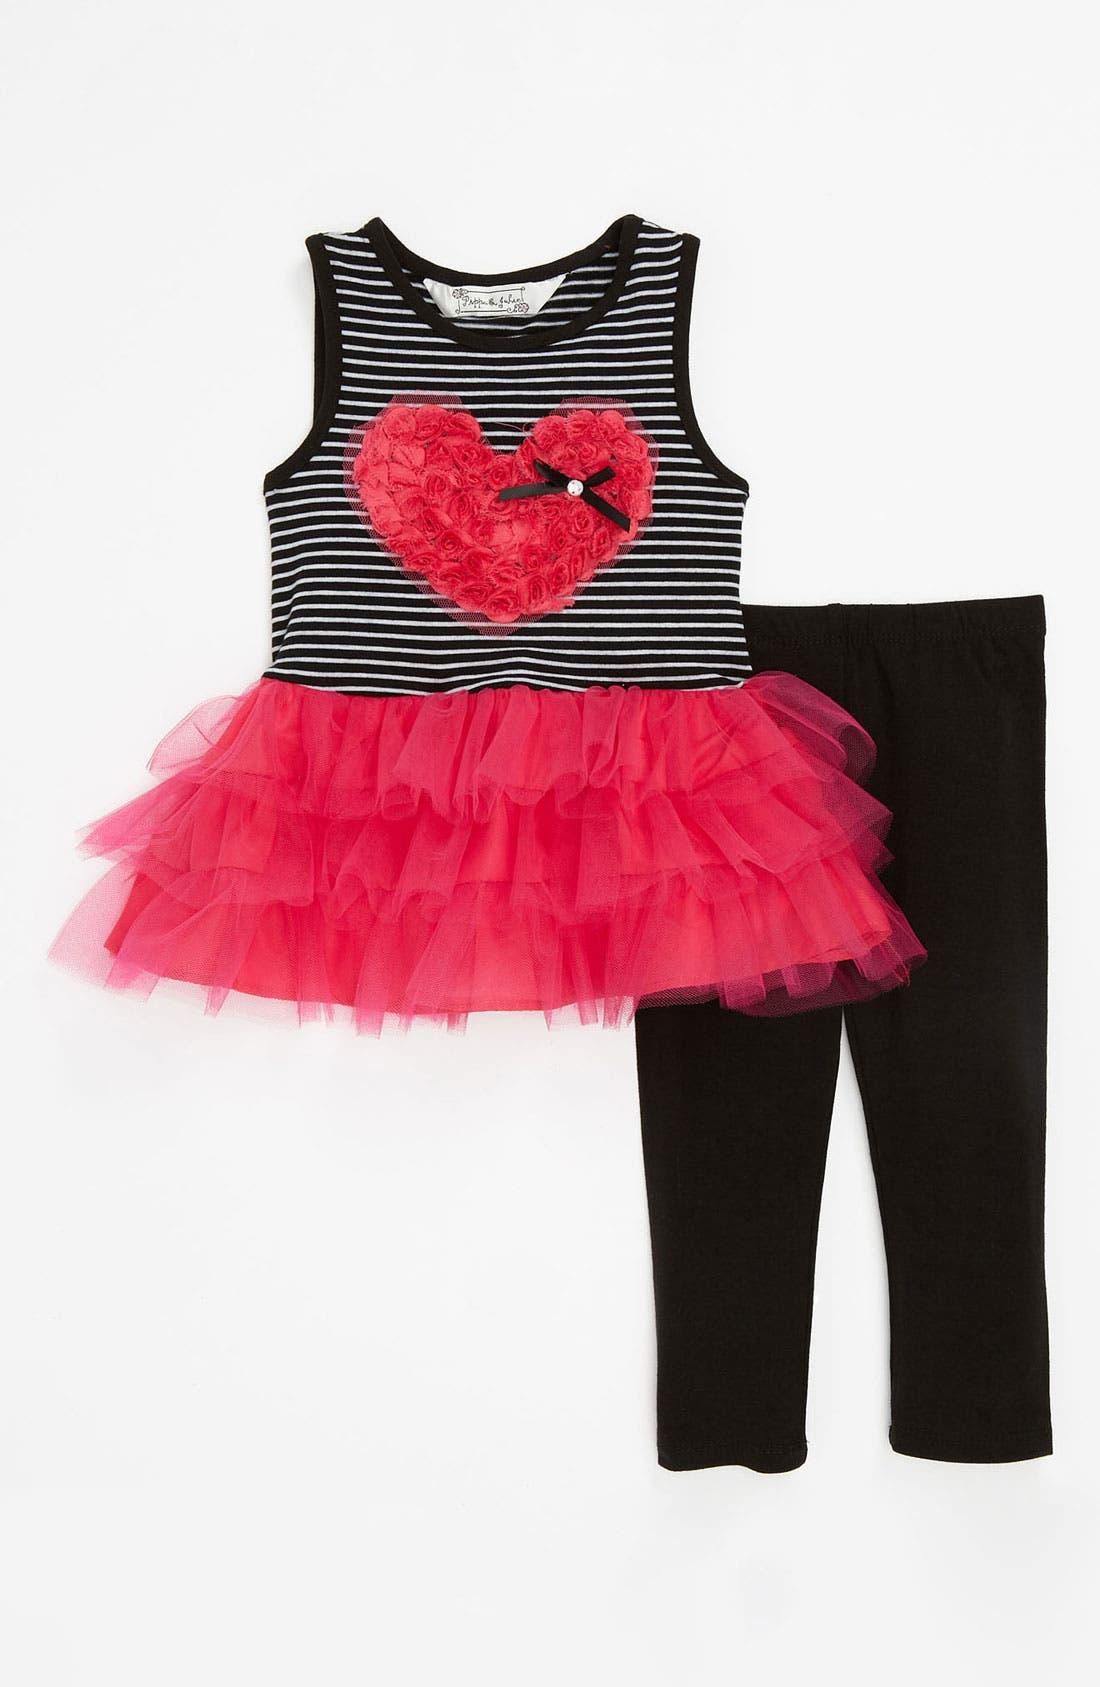 Main Image - Pippa & Julie Soutache Heart Top & Leggings (Toddler)